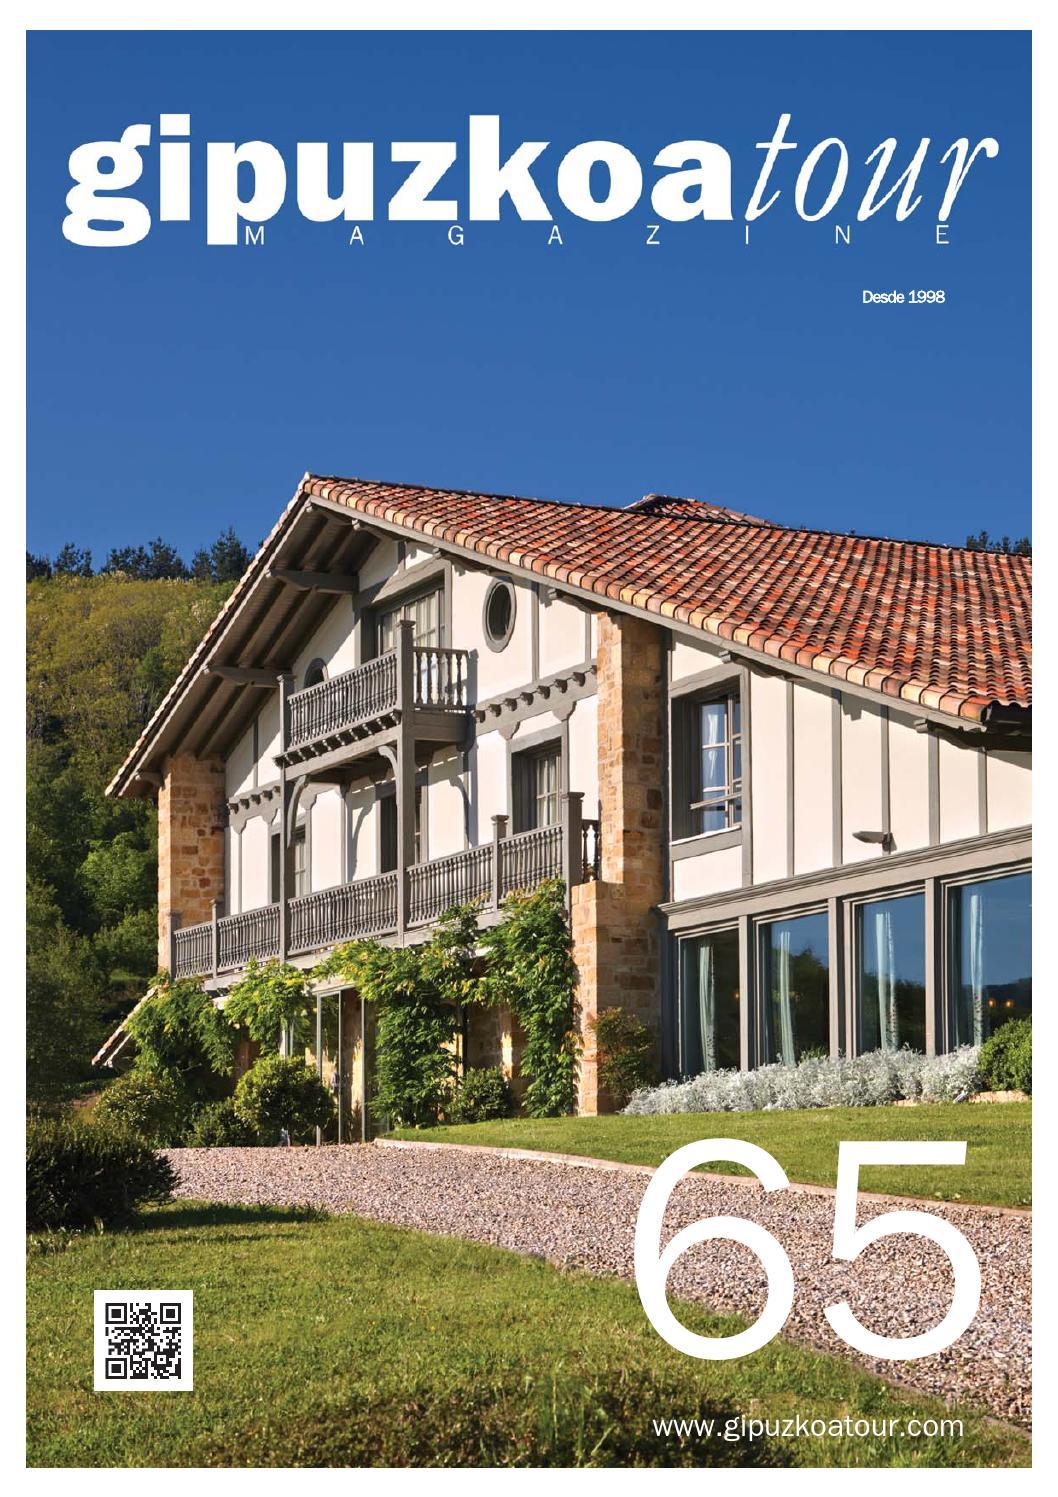 Gipuzkoatour 65 Magazine Issuu By Tour 3L5AR4j